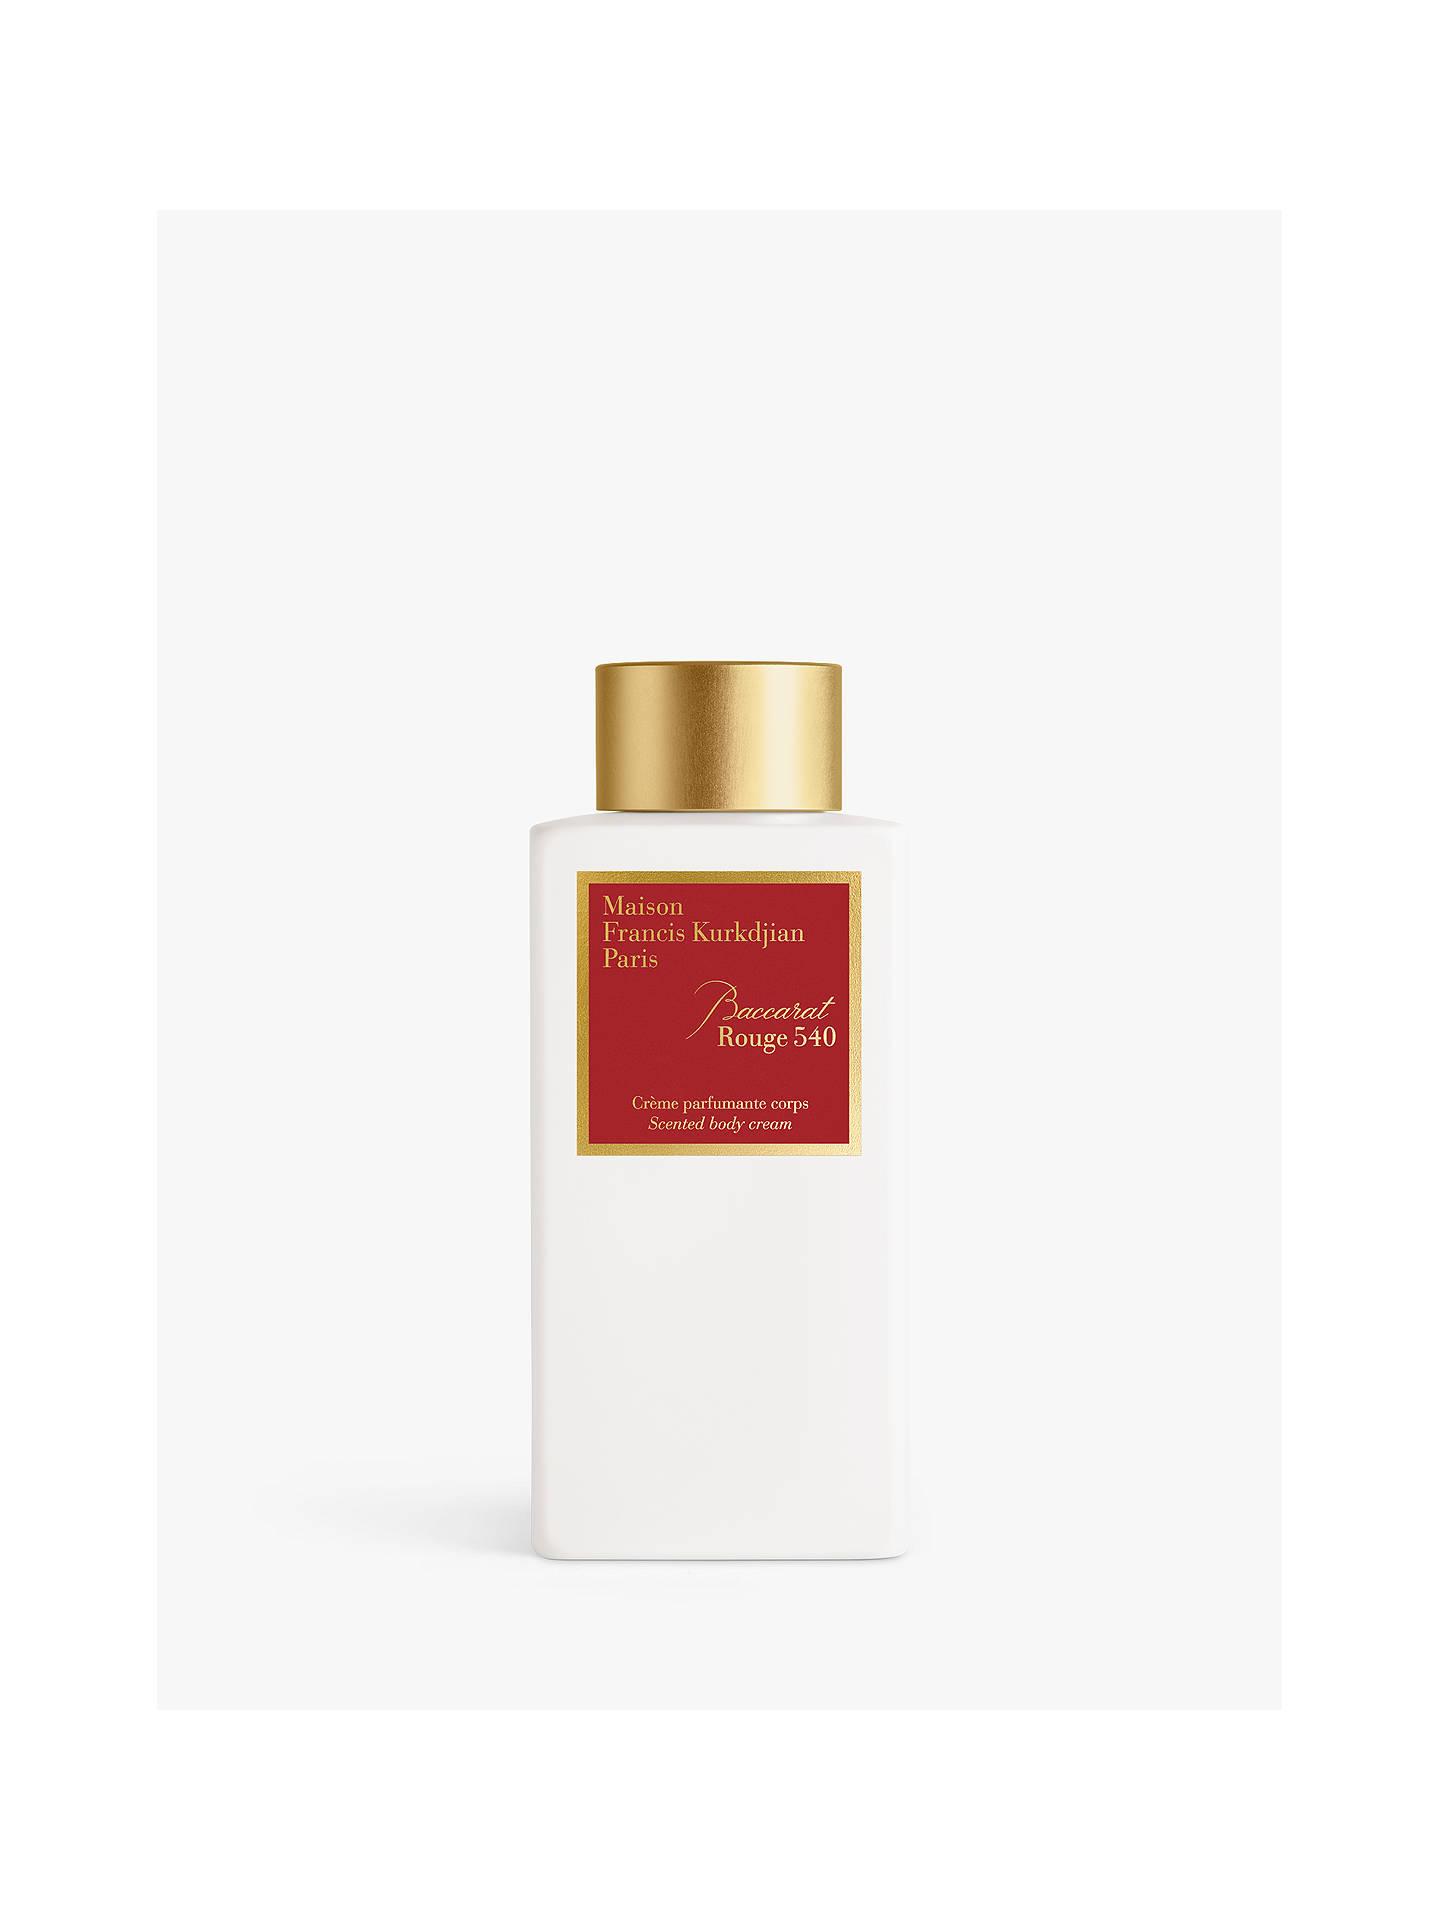 Maison Francis Kurkdjian Baccarat Rouge 540 Scented Body Cream, 250ml by Maison Francis Kurkdjian